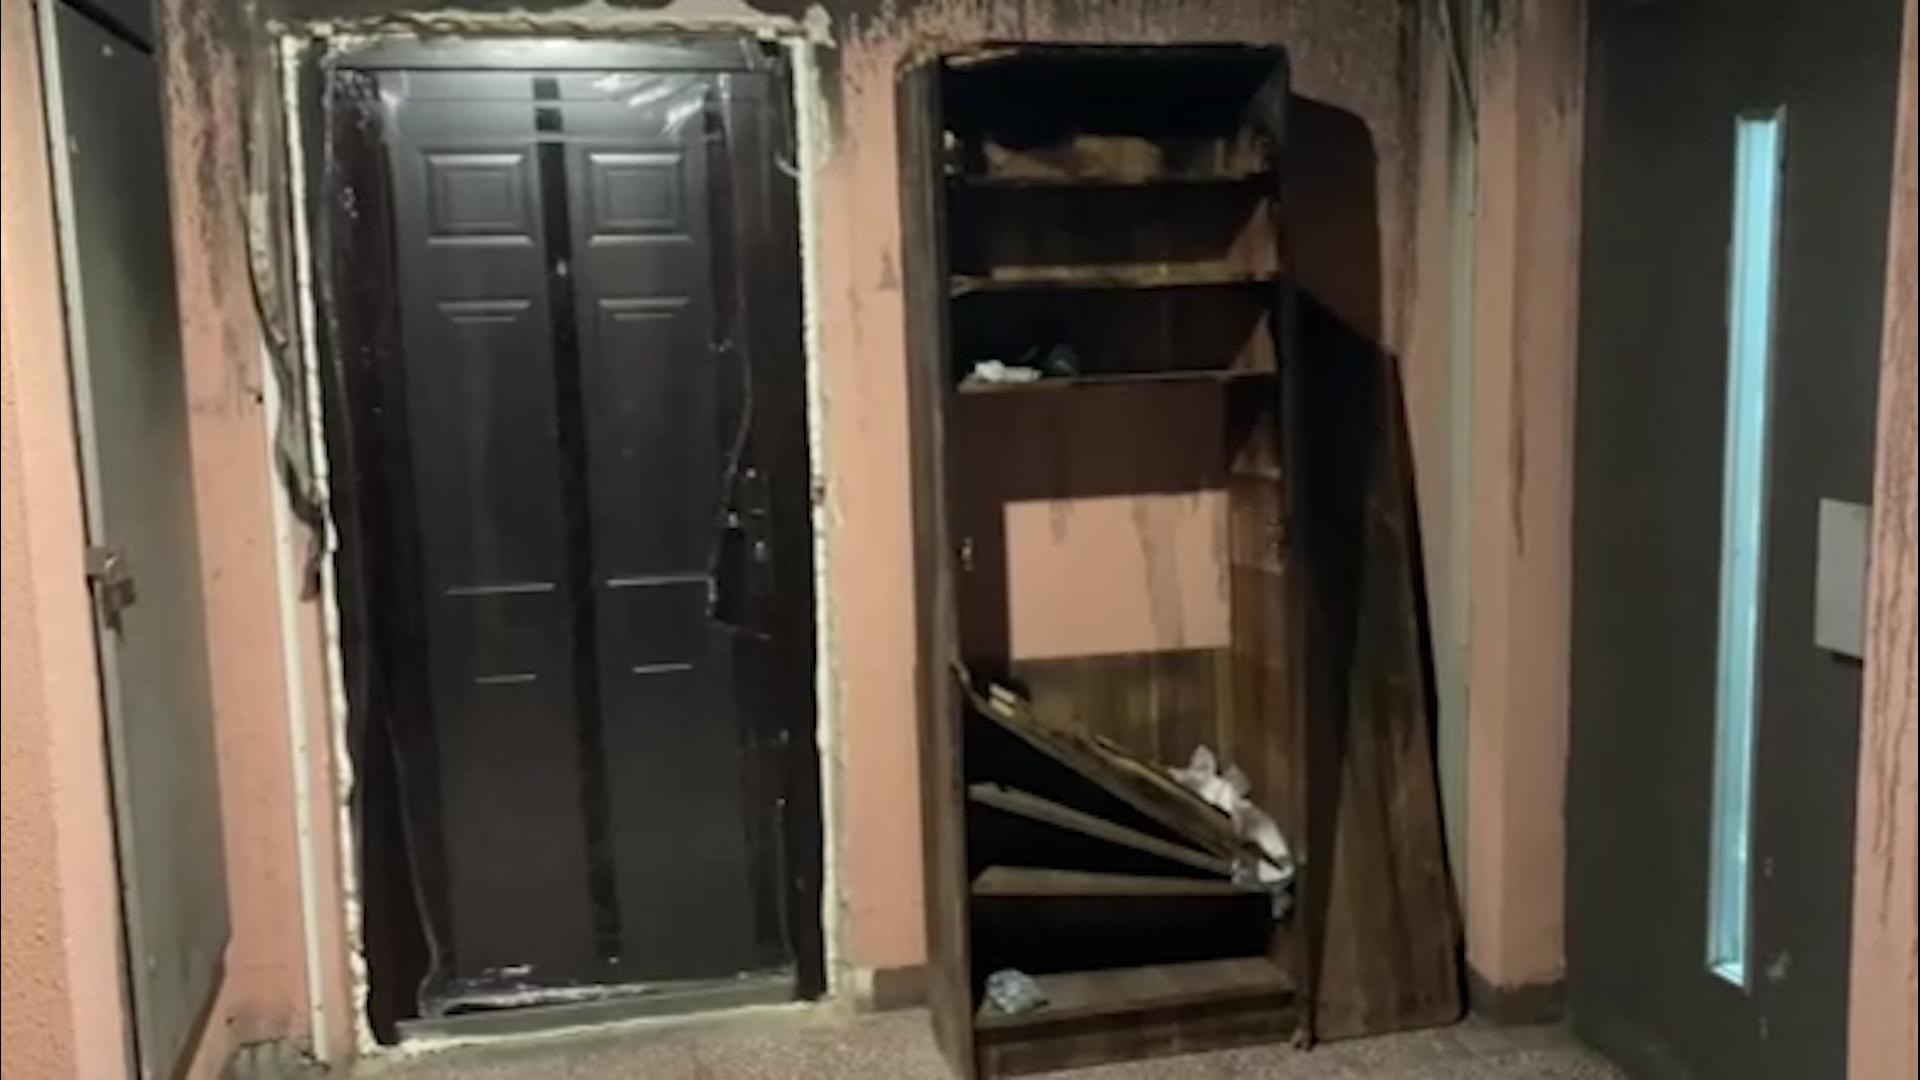 TUGA NA DORĆOLU: Renoviraju stan koji se zapalio, mala Minja izgubila bitku